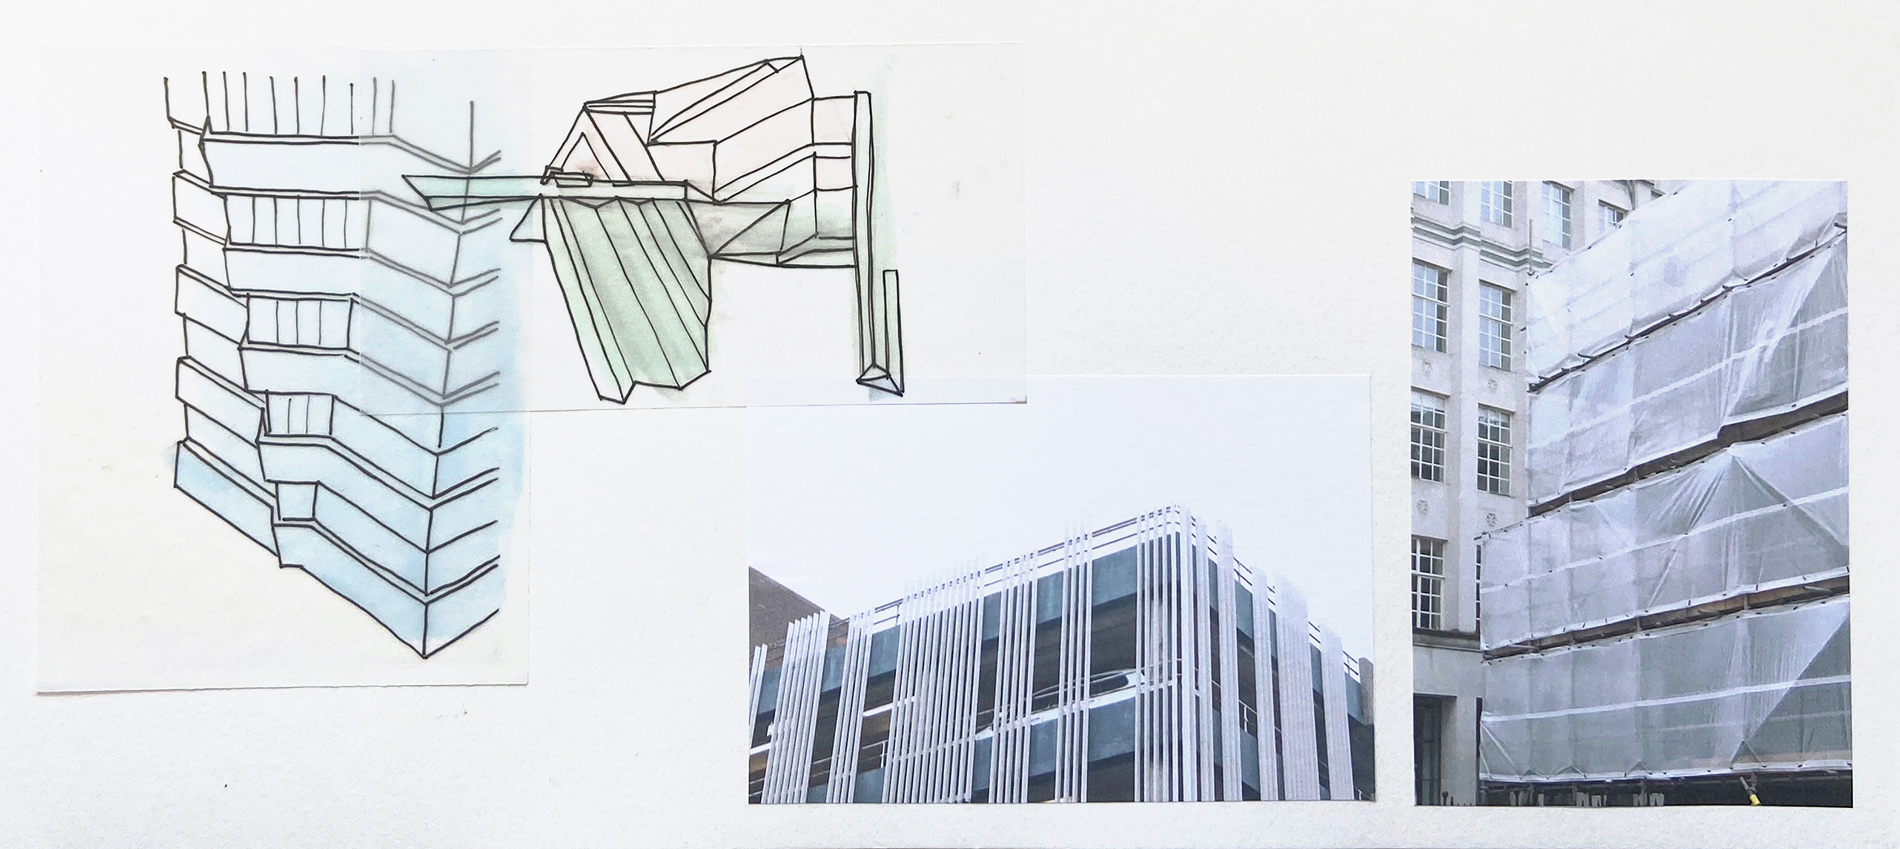 Chloe Solomon Jewellery Architecture Inspiration